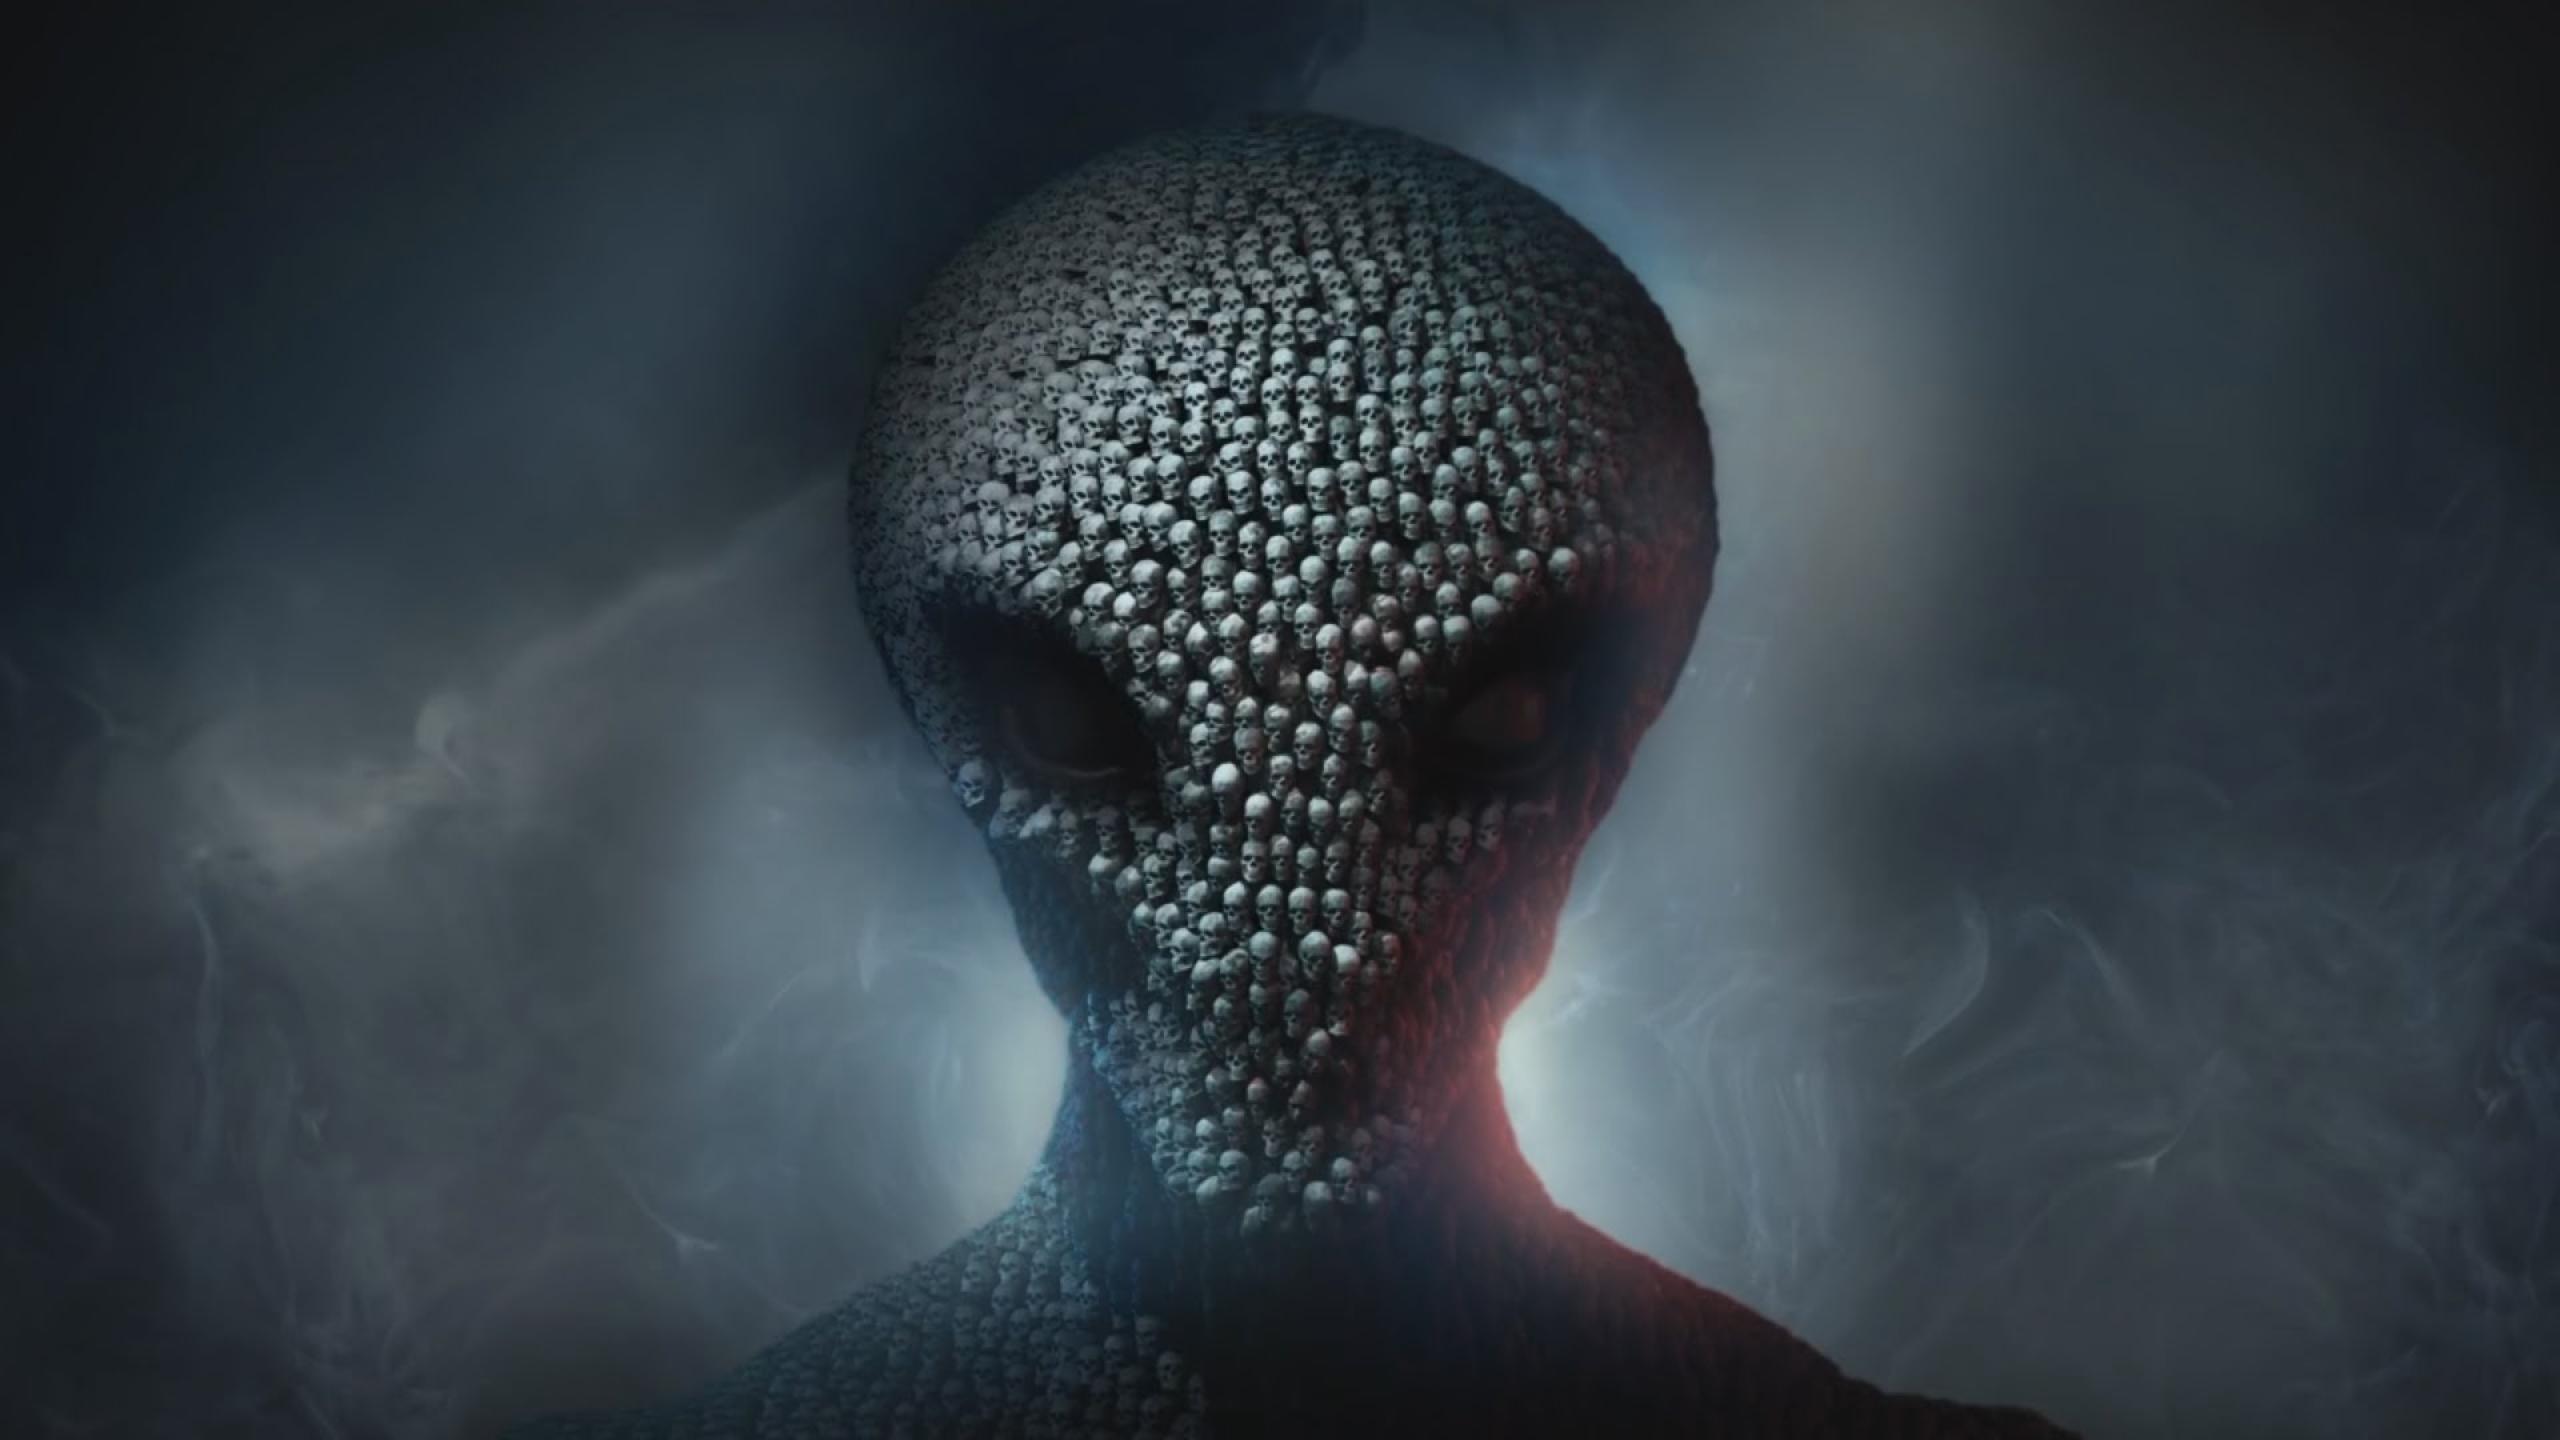 2560x1440 Xcom 2 Firaxis Games Alien 1440P Resolution ...